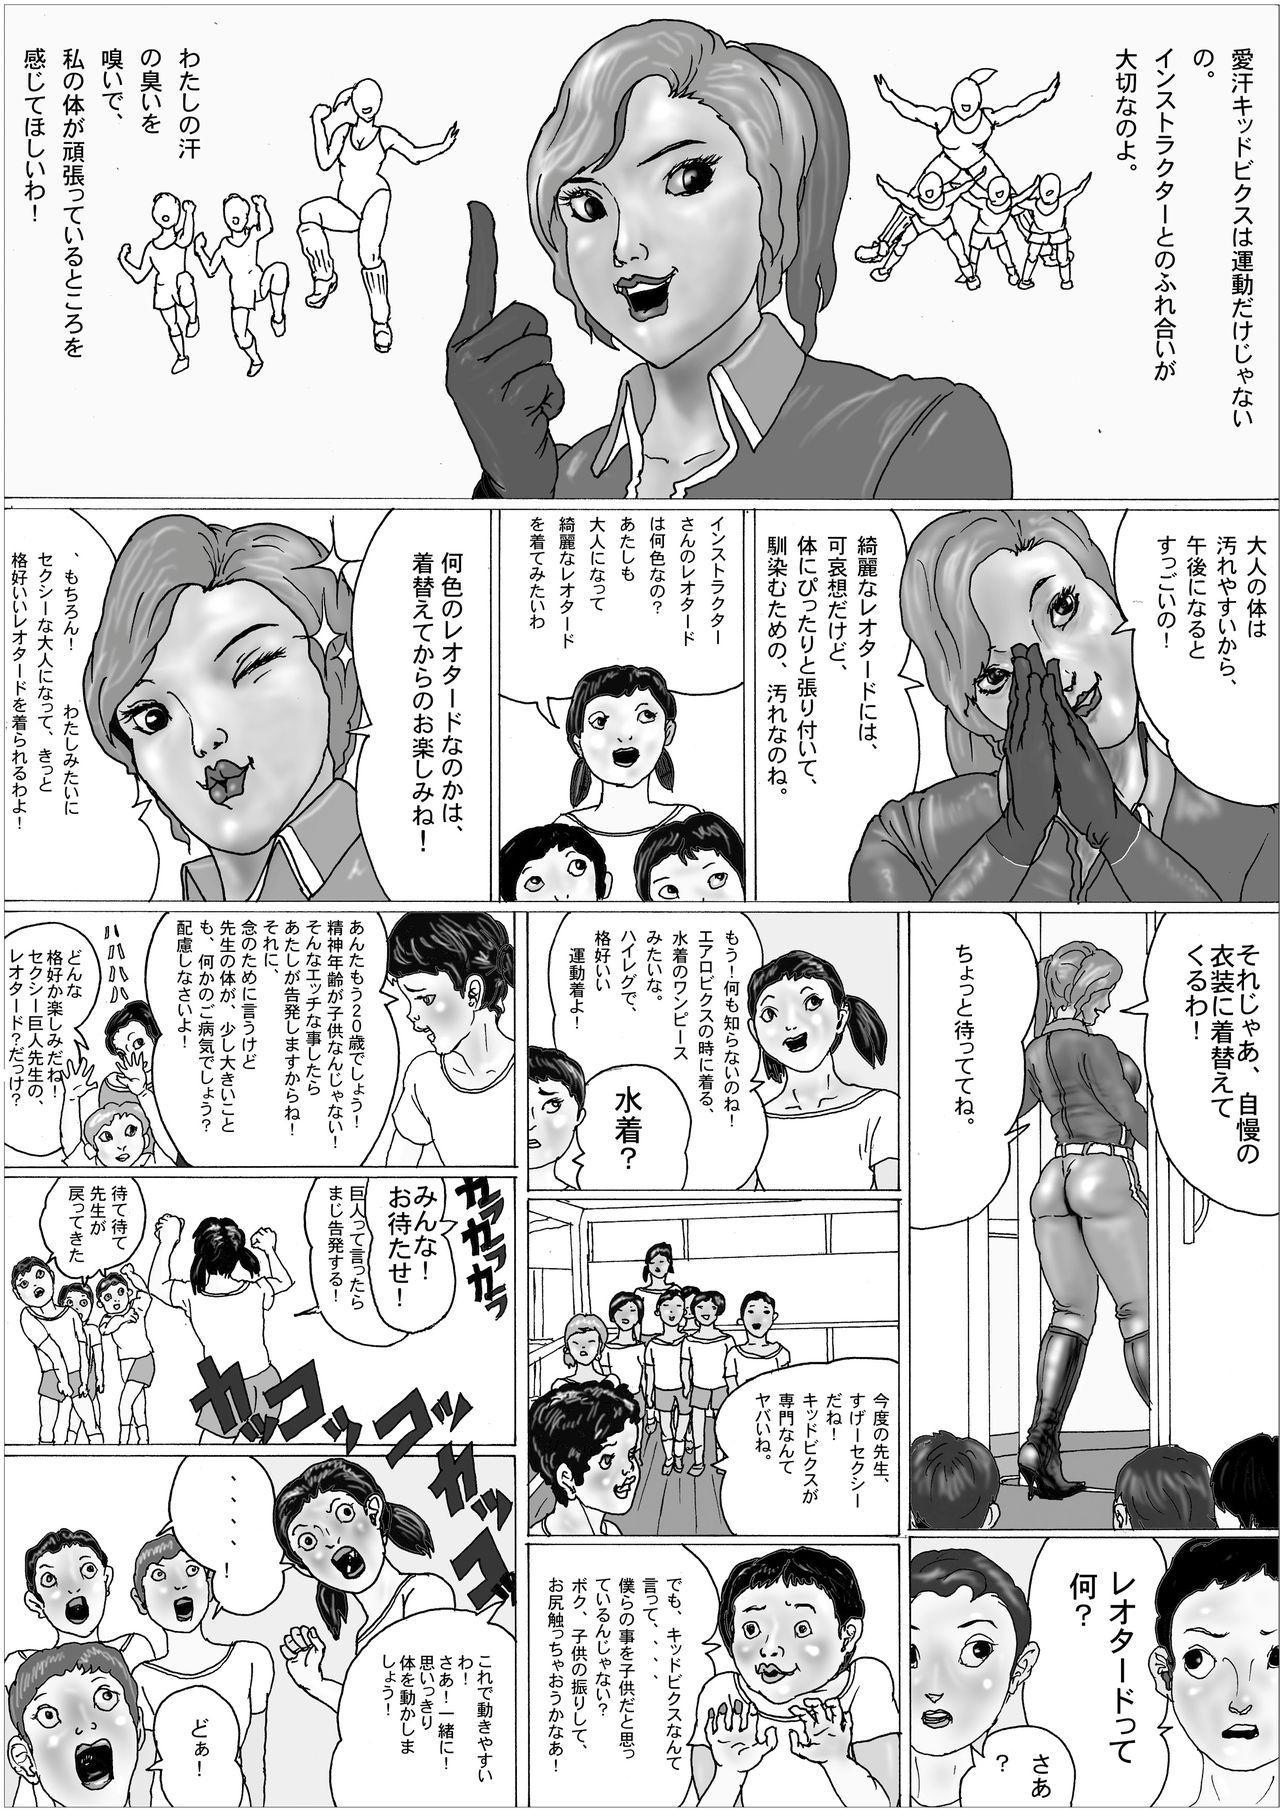 Kyosei kara Kita Aerobi Instructor K - Aerobics Instructor K came from a huge star 82